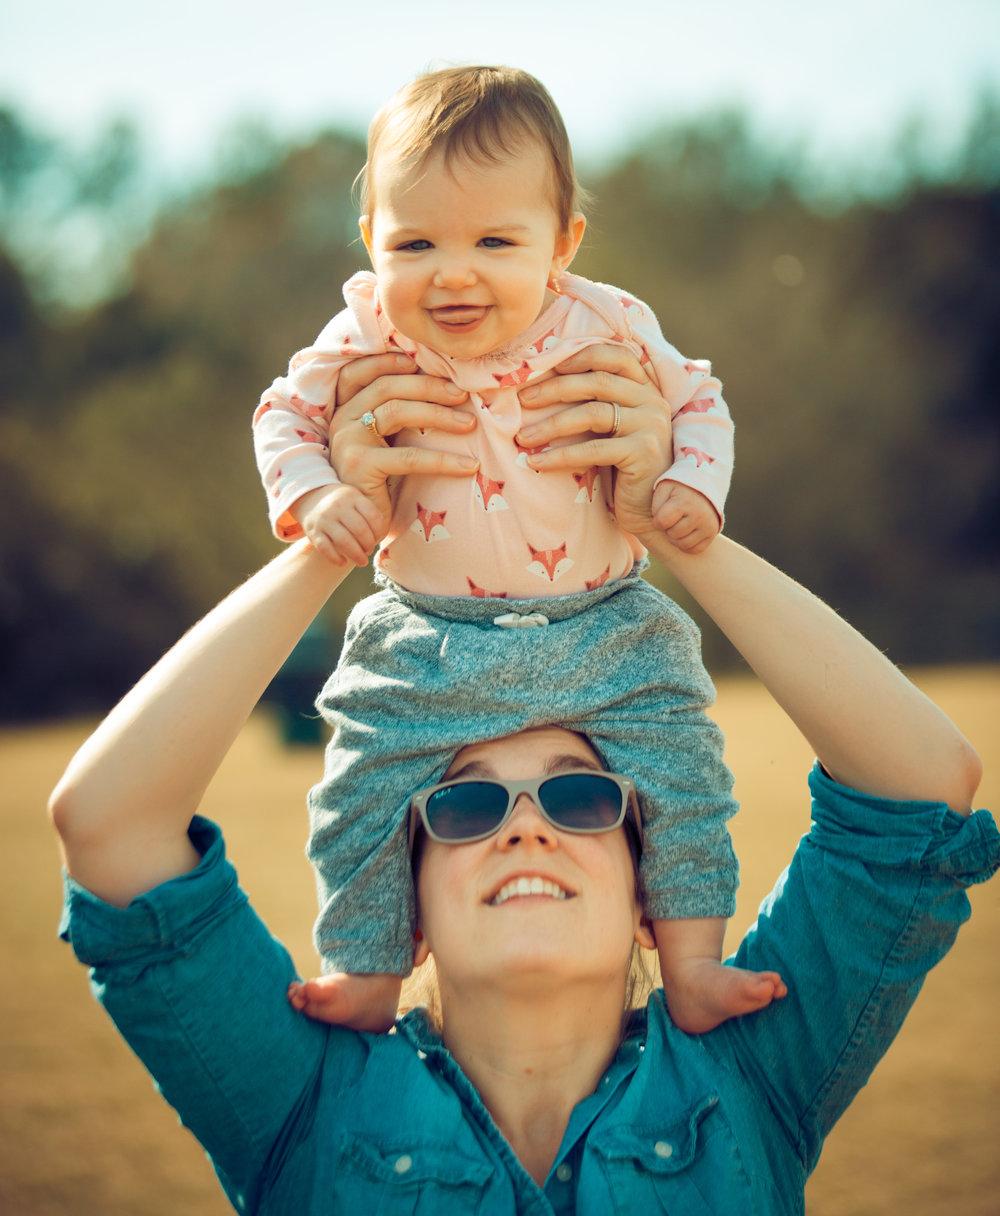 Corinne & Baby Alice      Social Media Direcor and Intern